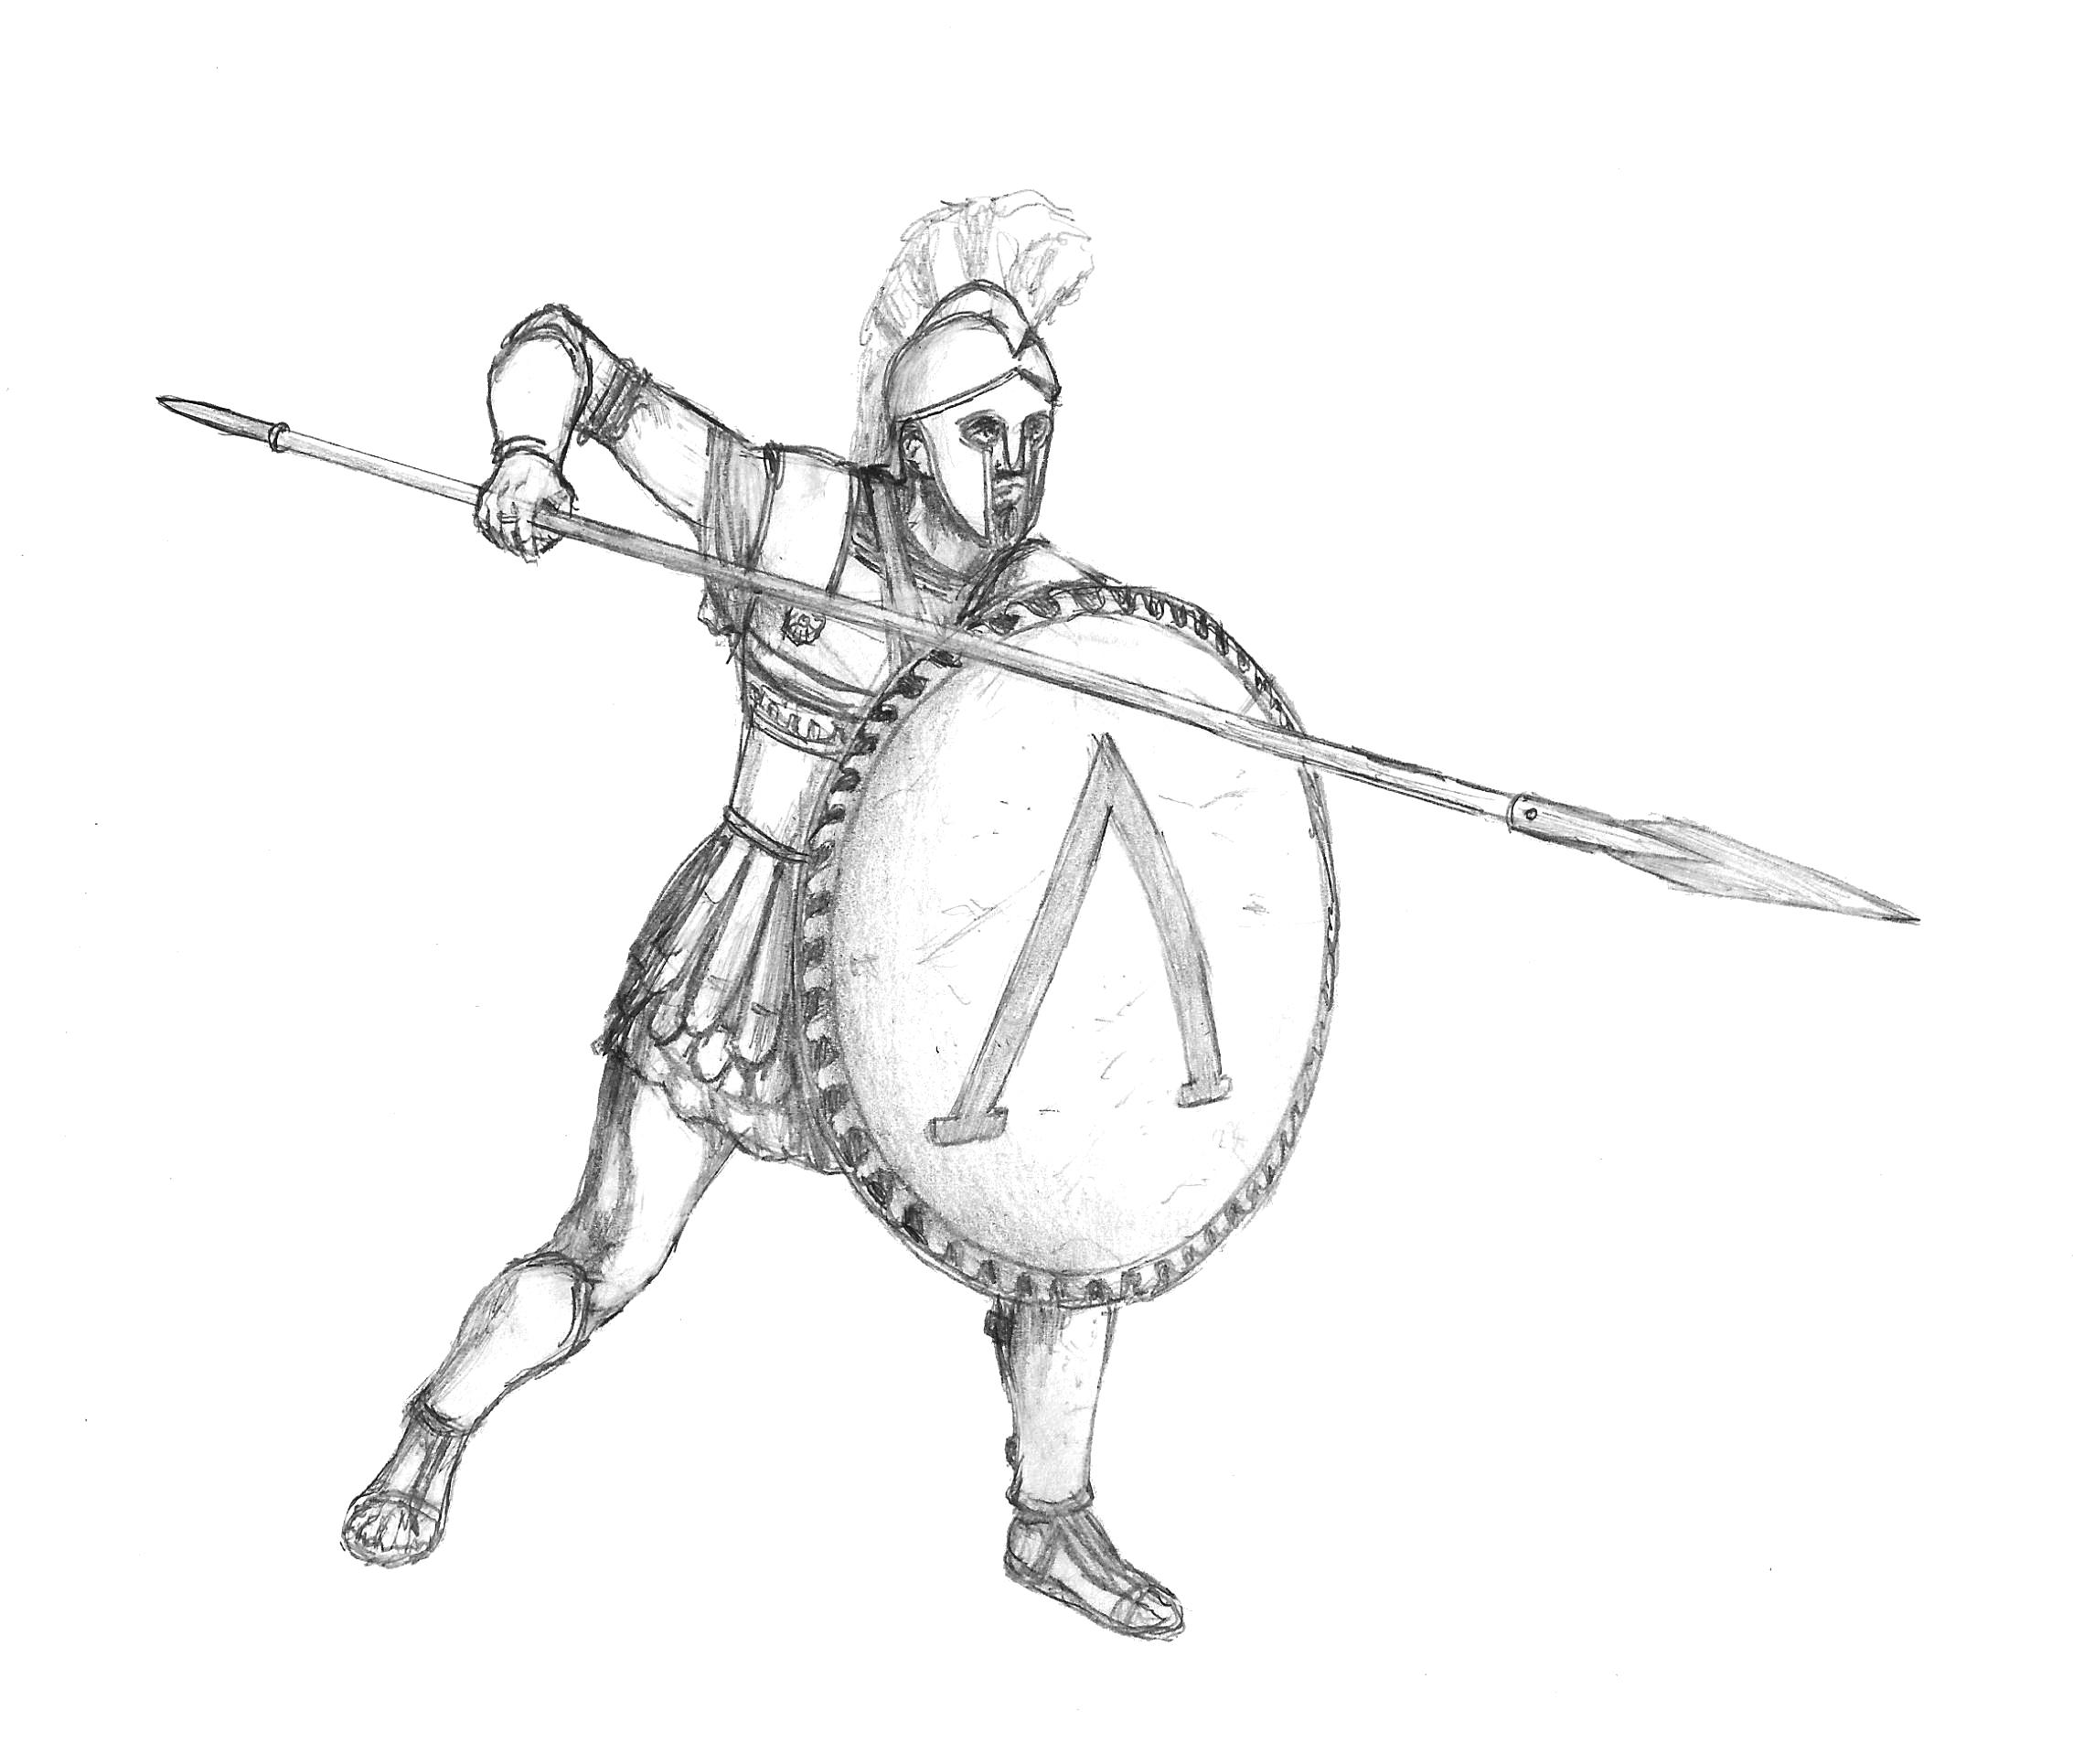 Spartan Hoplite By B4ld3r On Deviantart